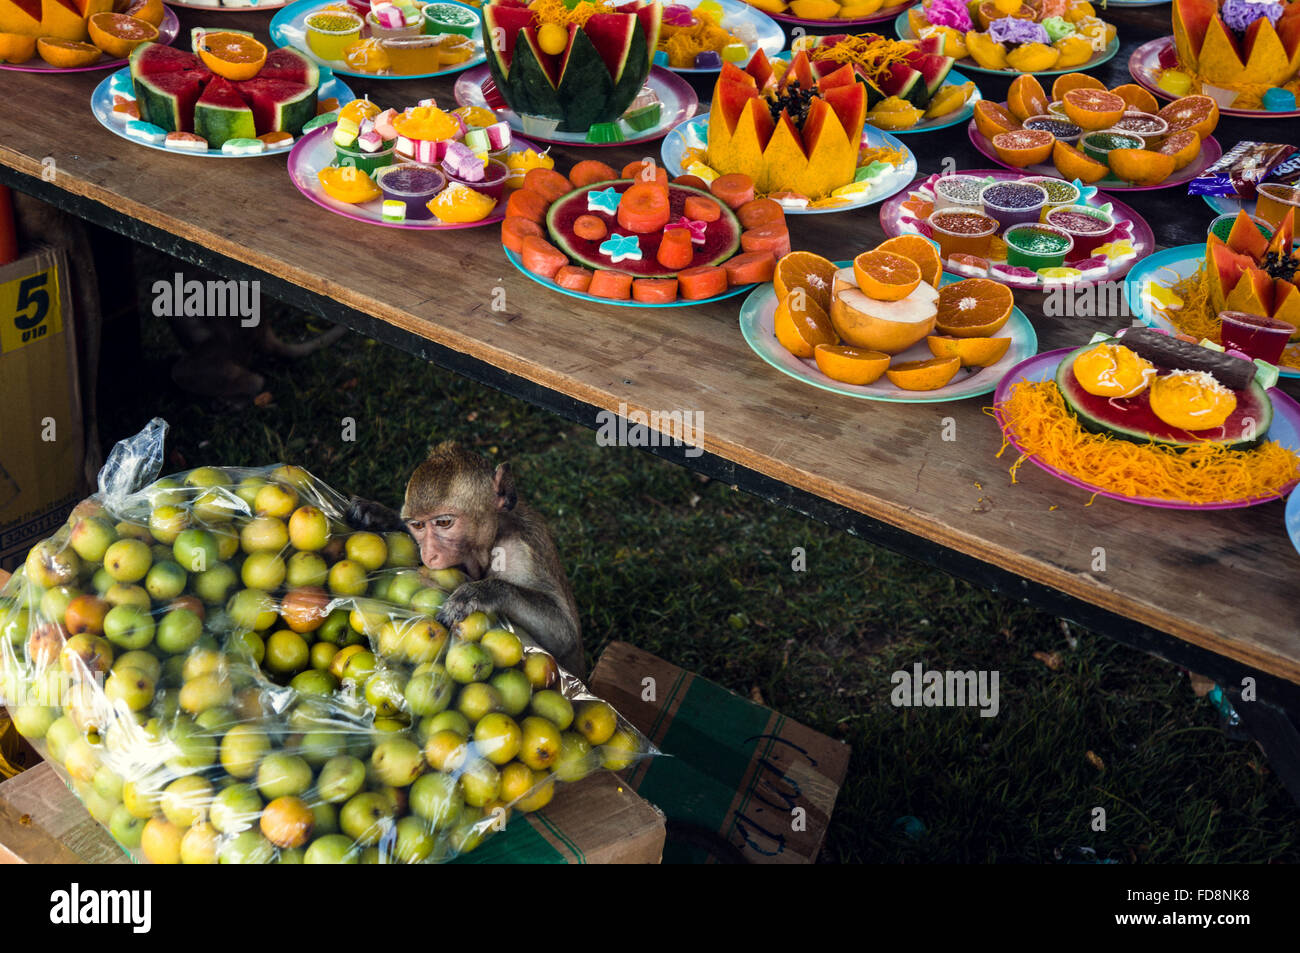 Affe In der Garküche In traditionellen Festival Stockbild